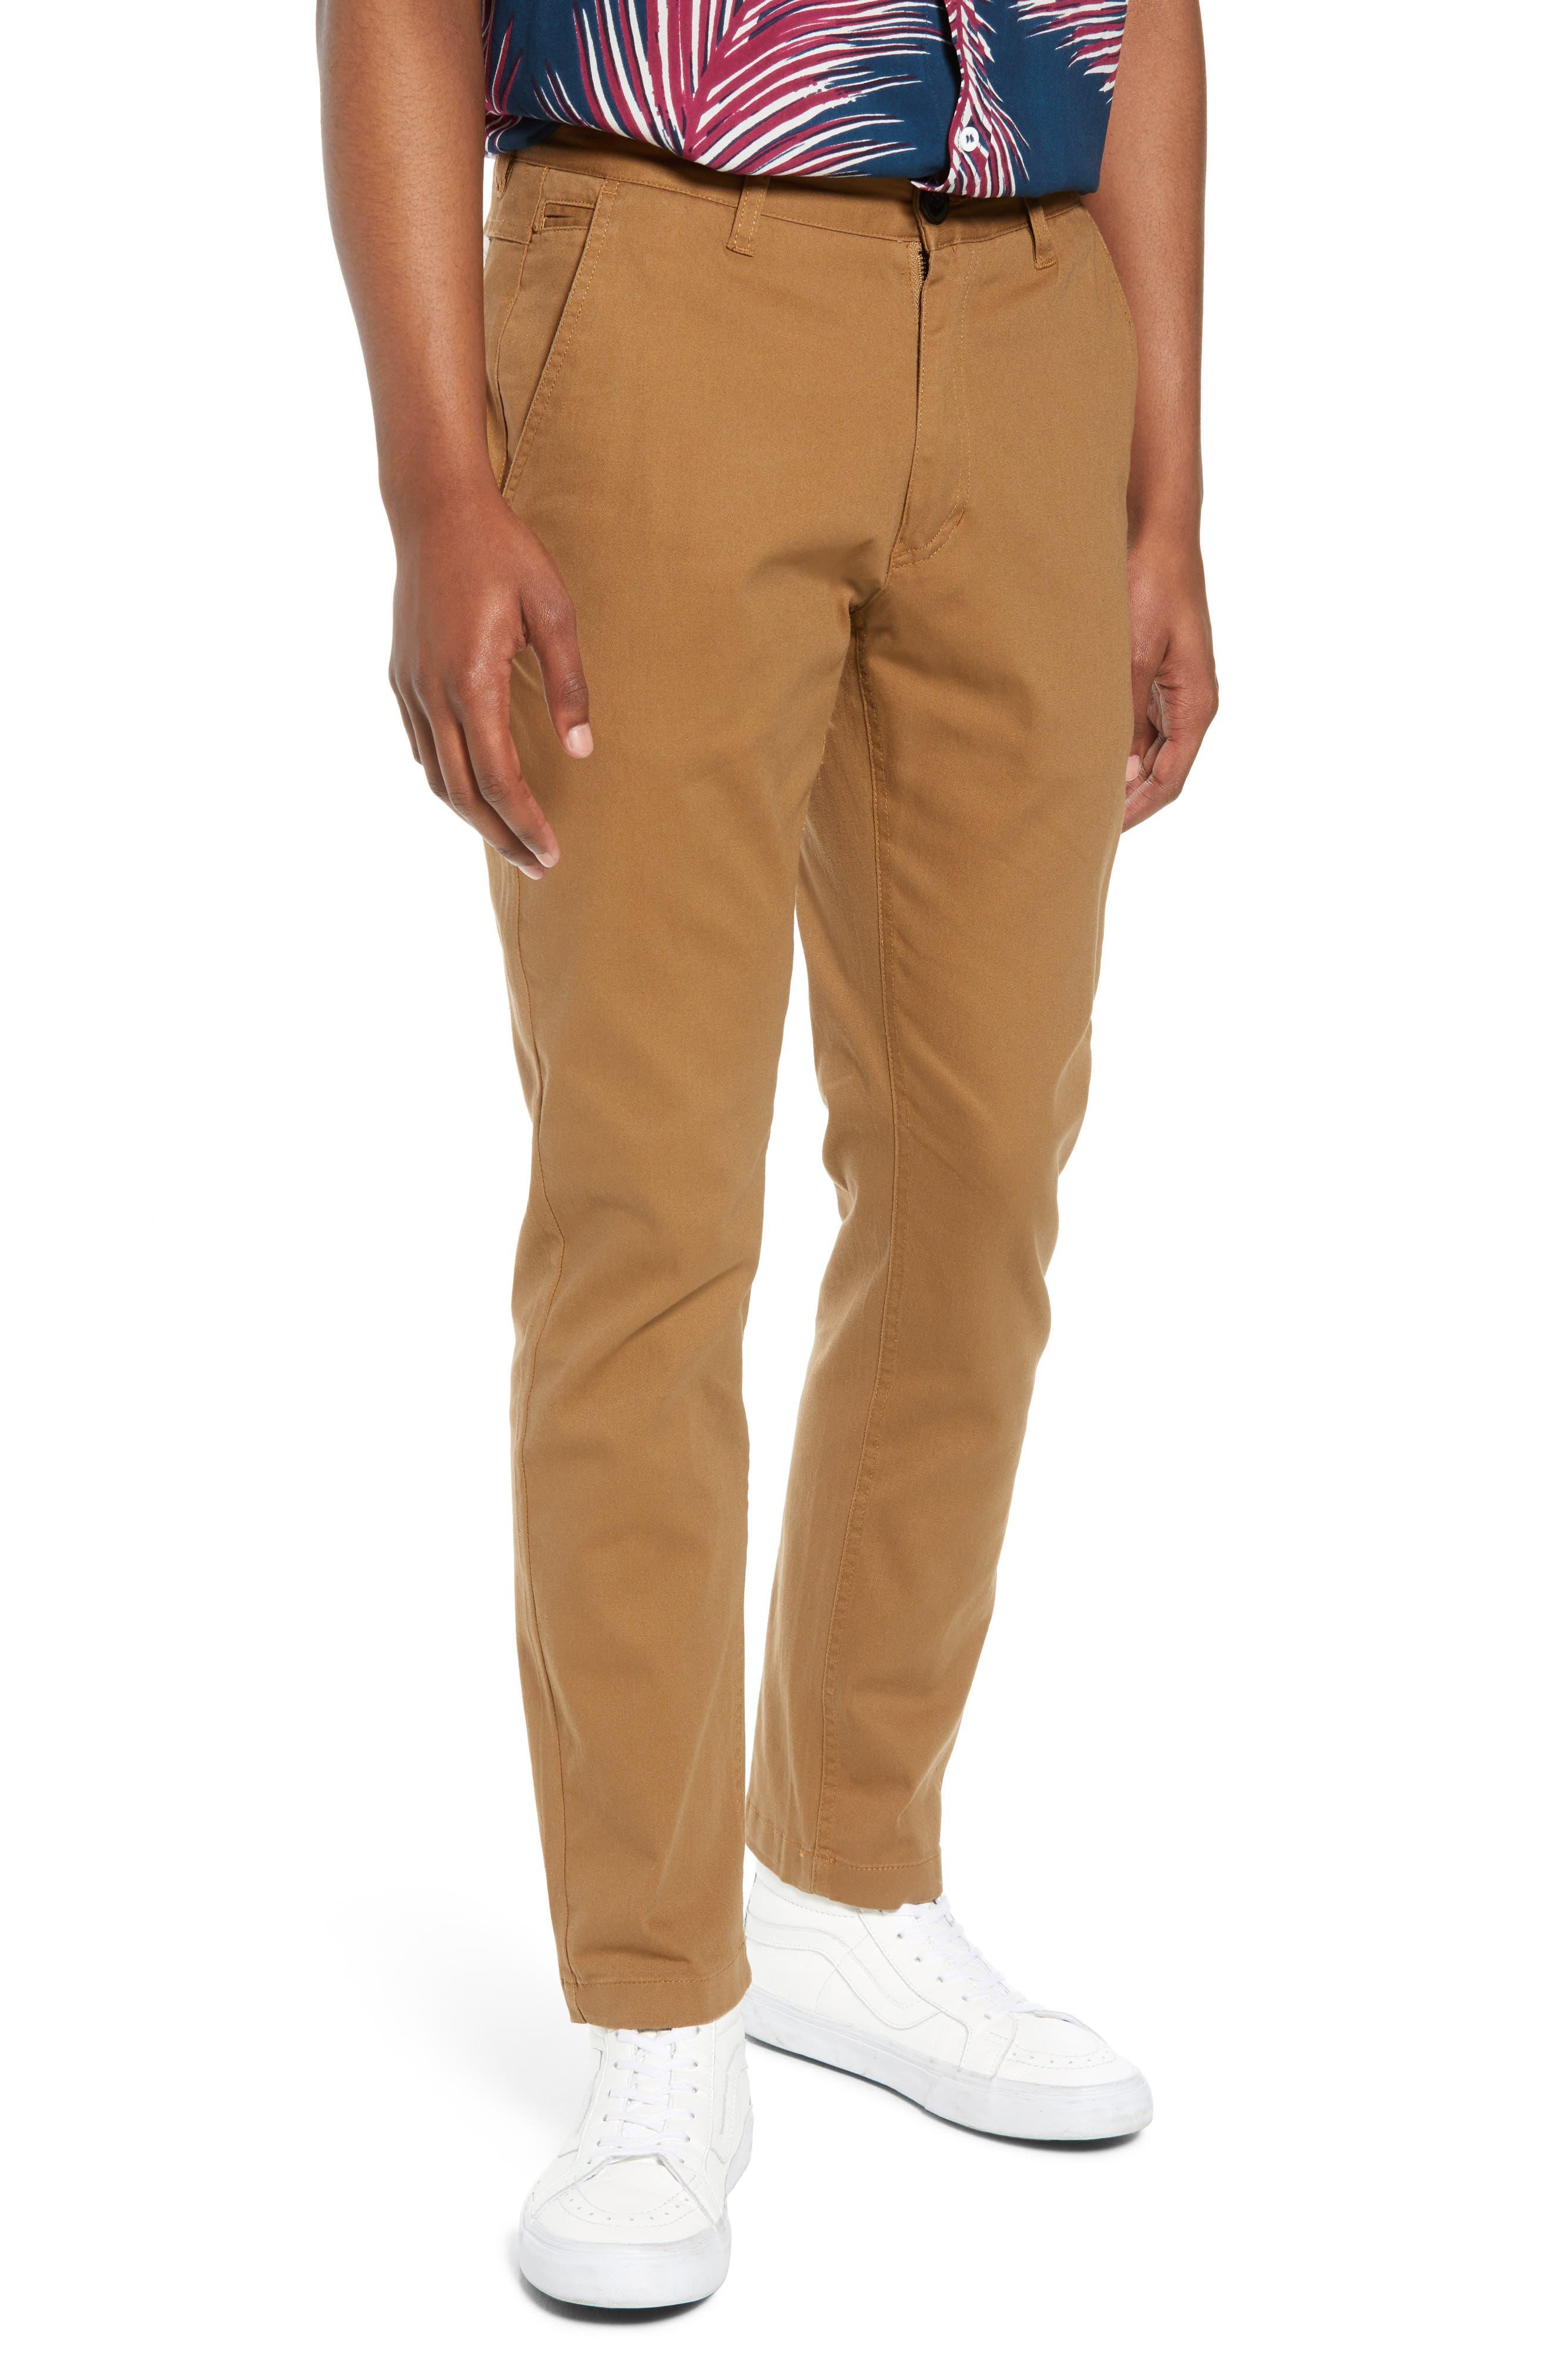 Crossroad Slim Fit Pants,                             Main thumbnail 1, color,                             Khaki